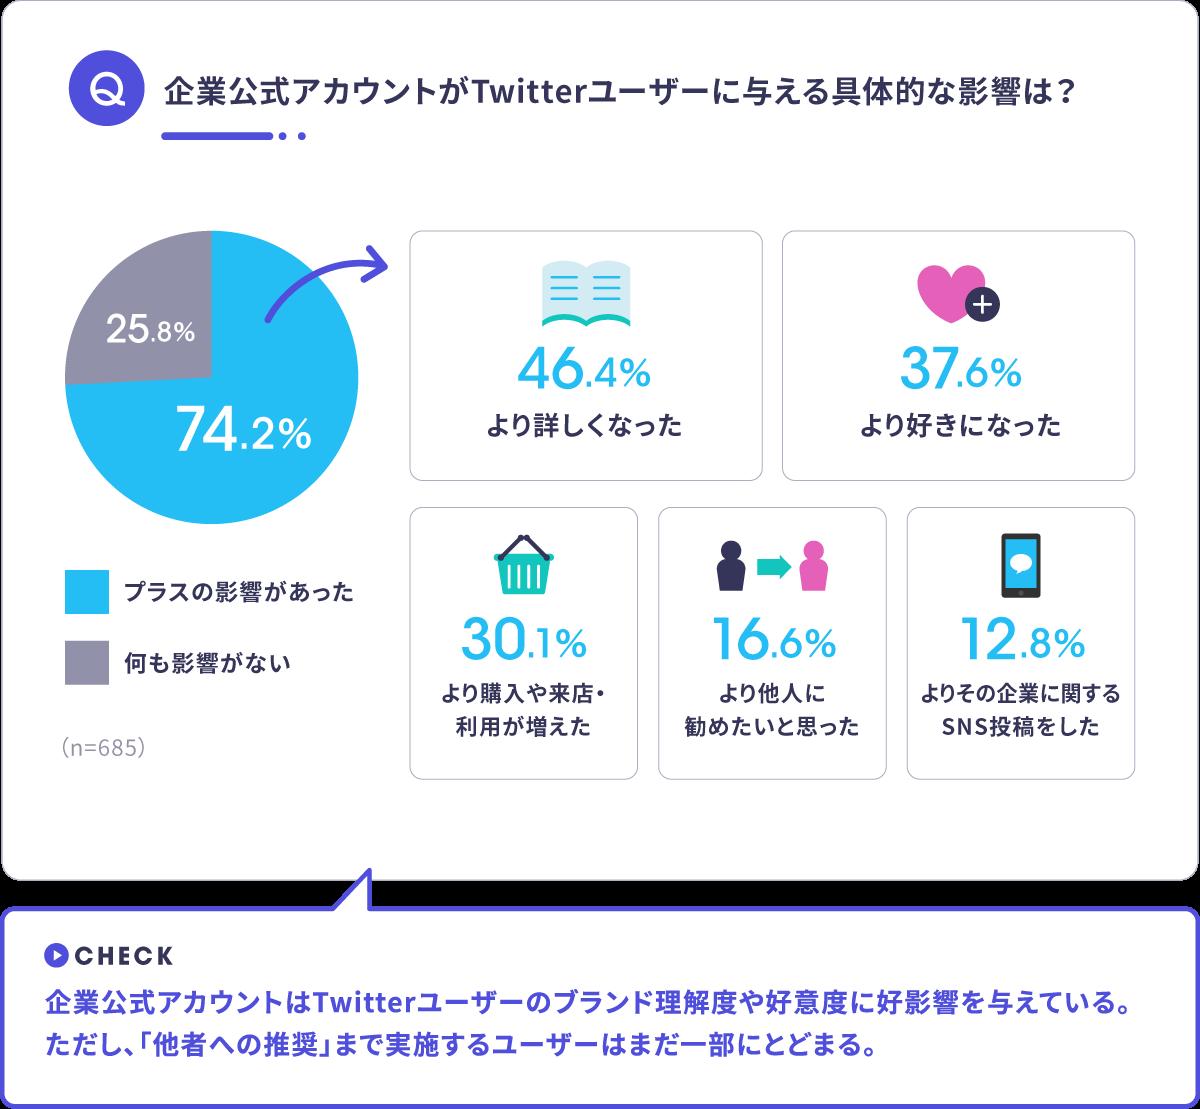 kigyou公式アカウントがTwitterユーザーに与える影響 グラフ